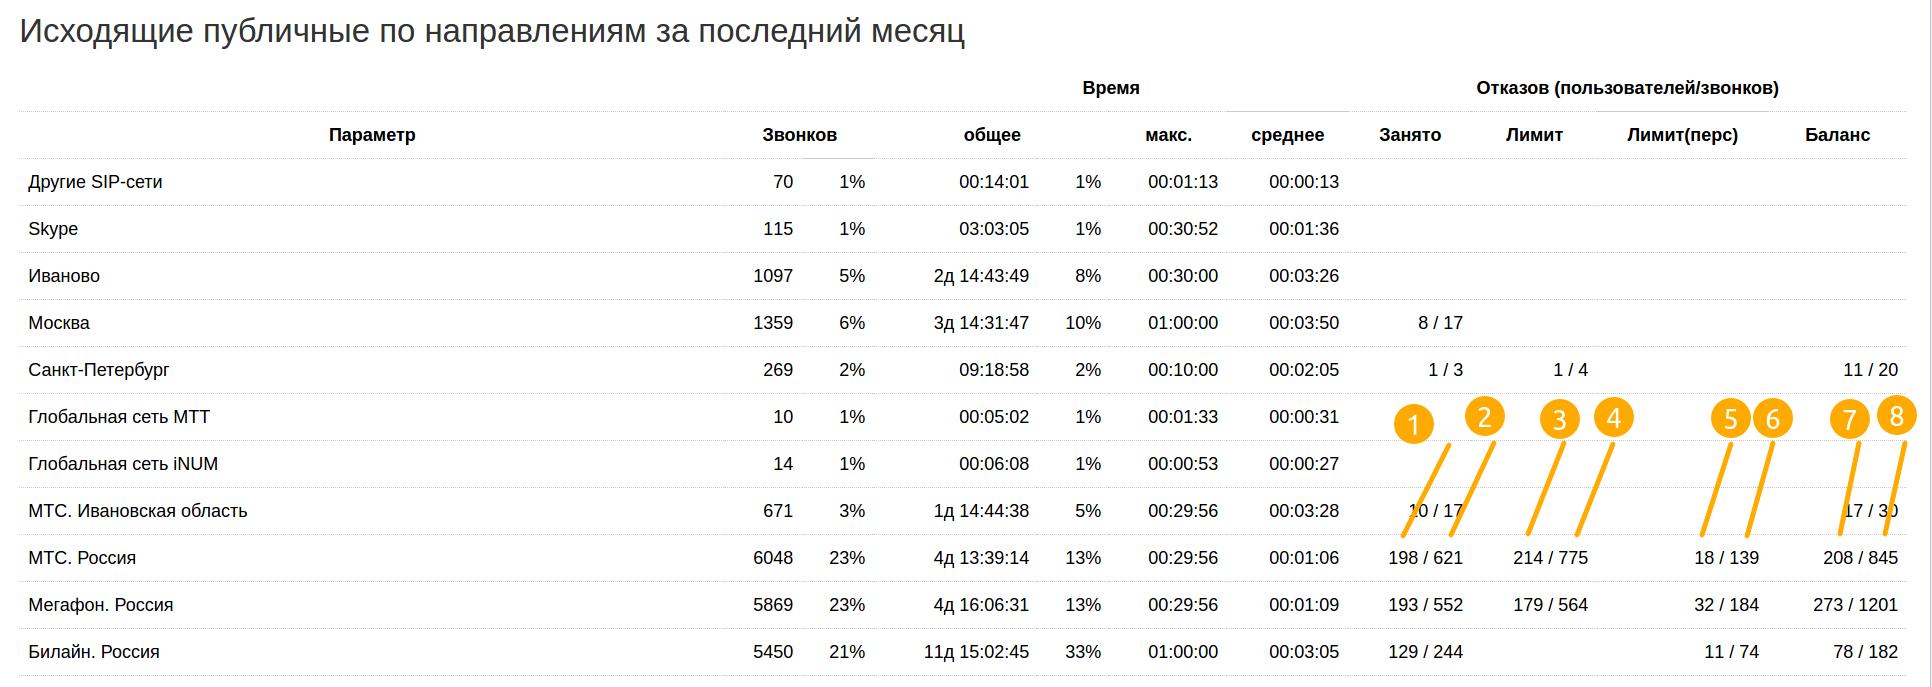 статистика сервиса talk37.ru